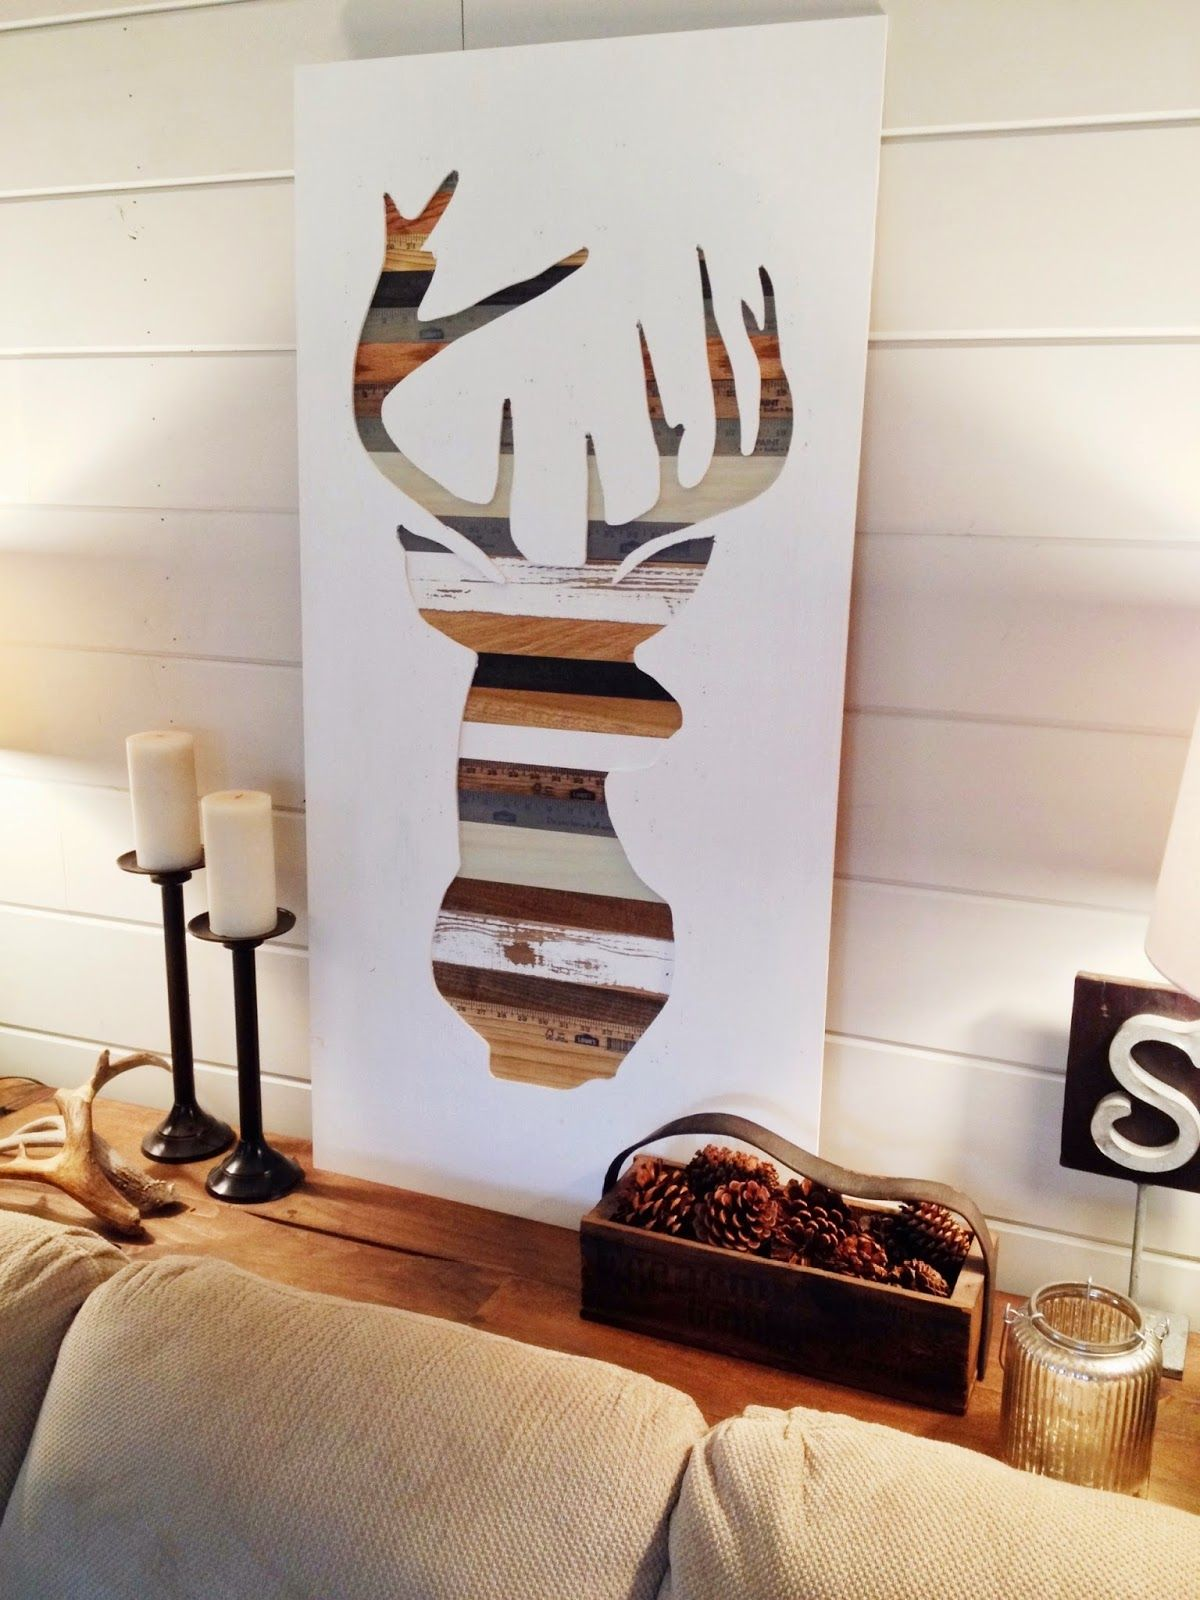 diy wood wall art projects | design ideas | diy wood wall